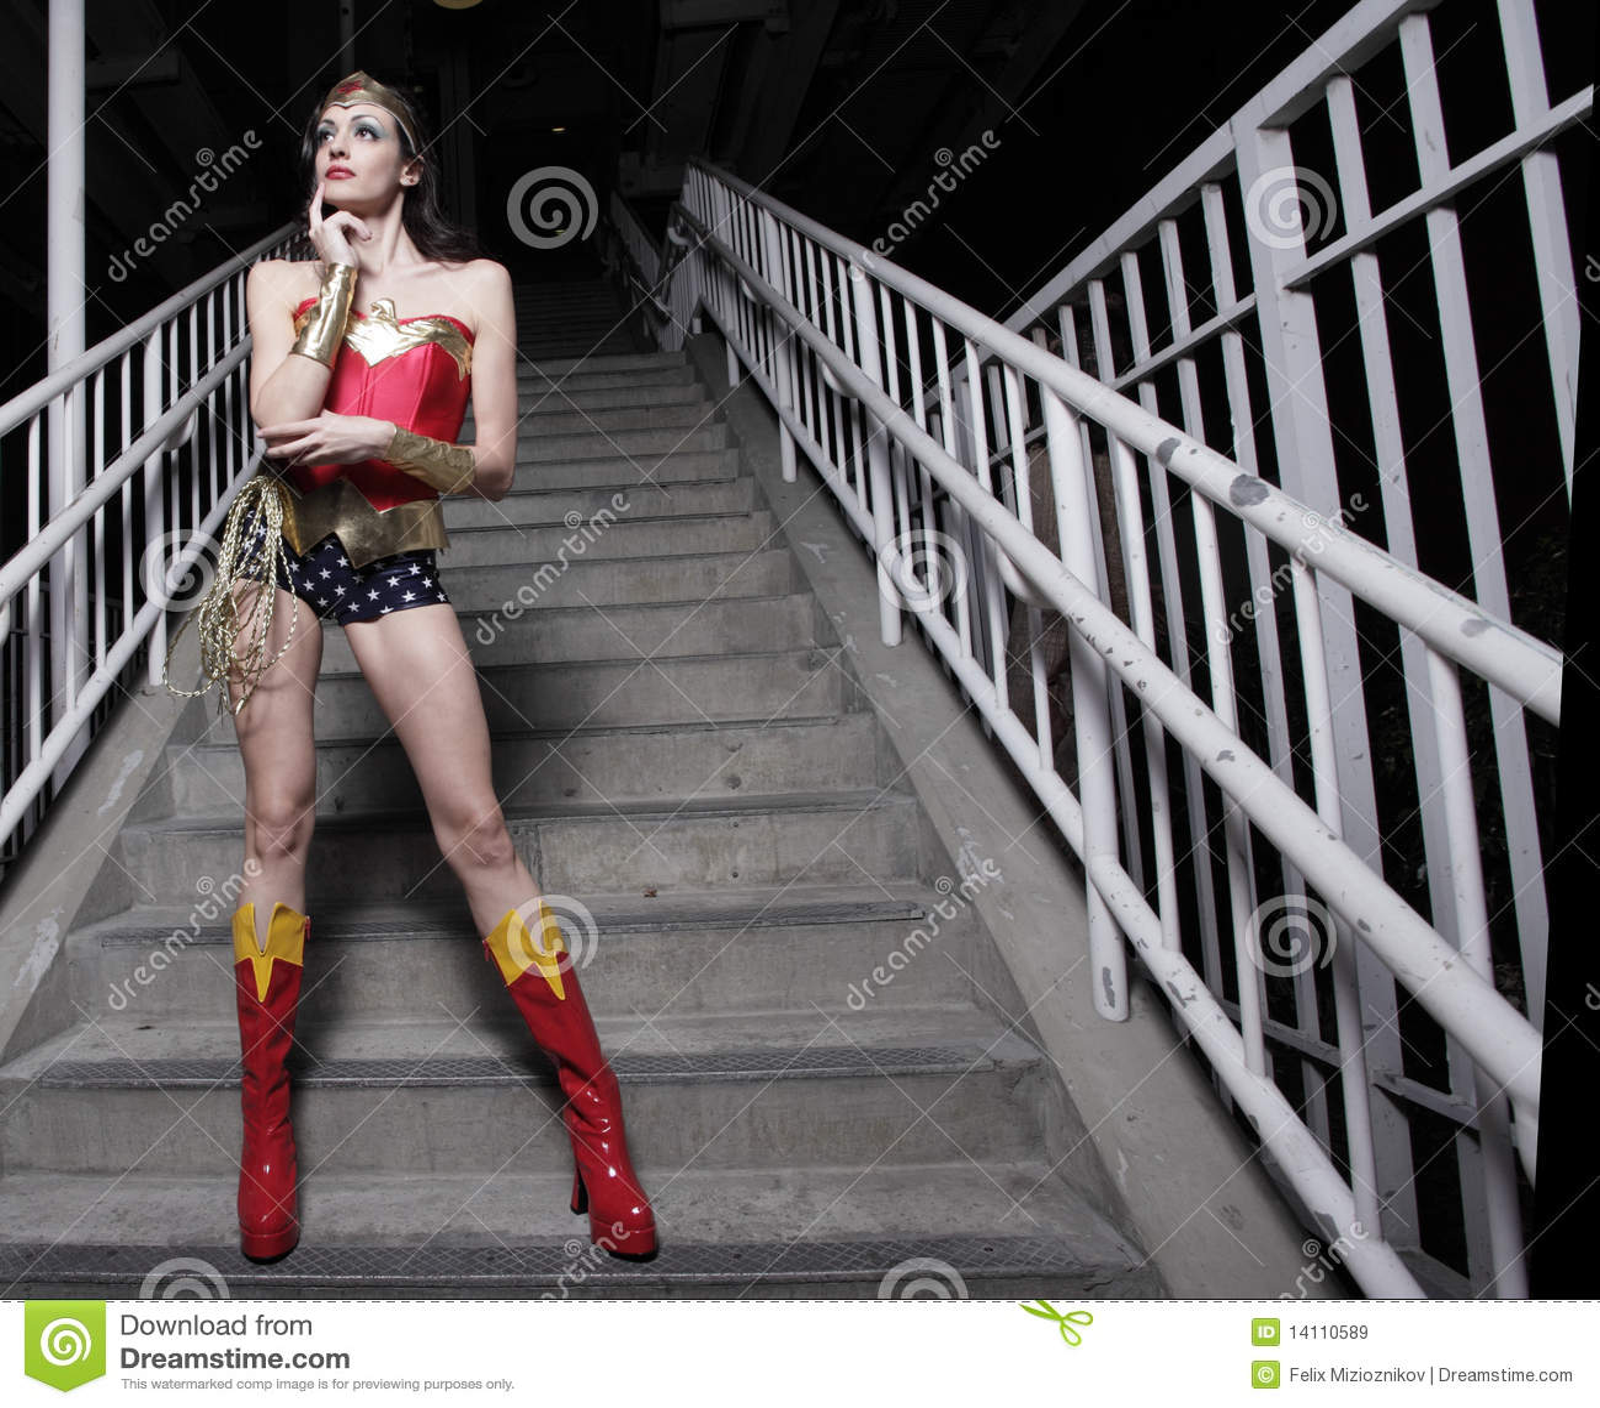 femme dans un costume de superhero image stock image du. Black Bedroom Furniture Sets. Home Design Ideas